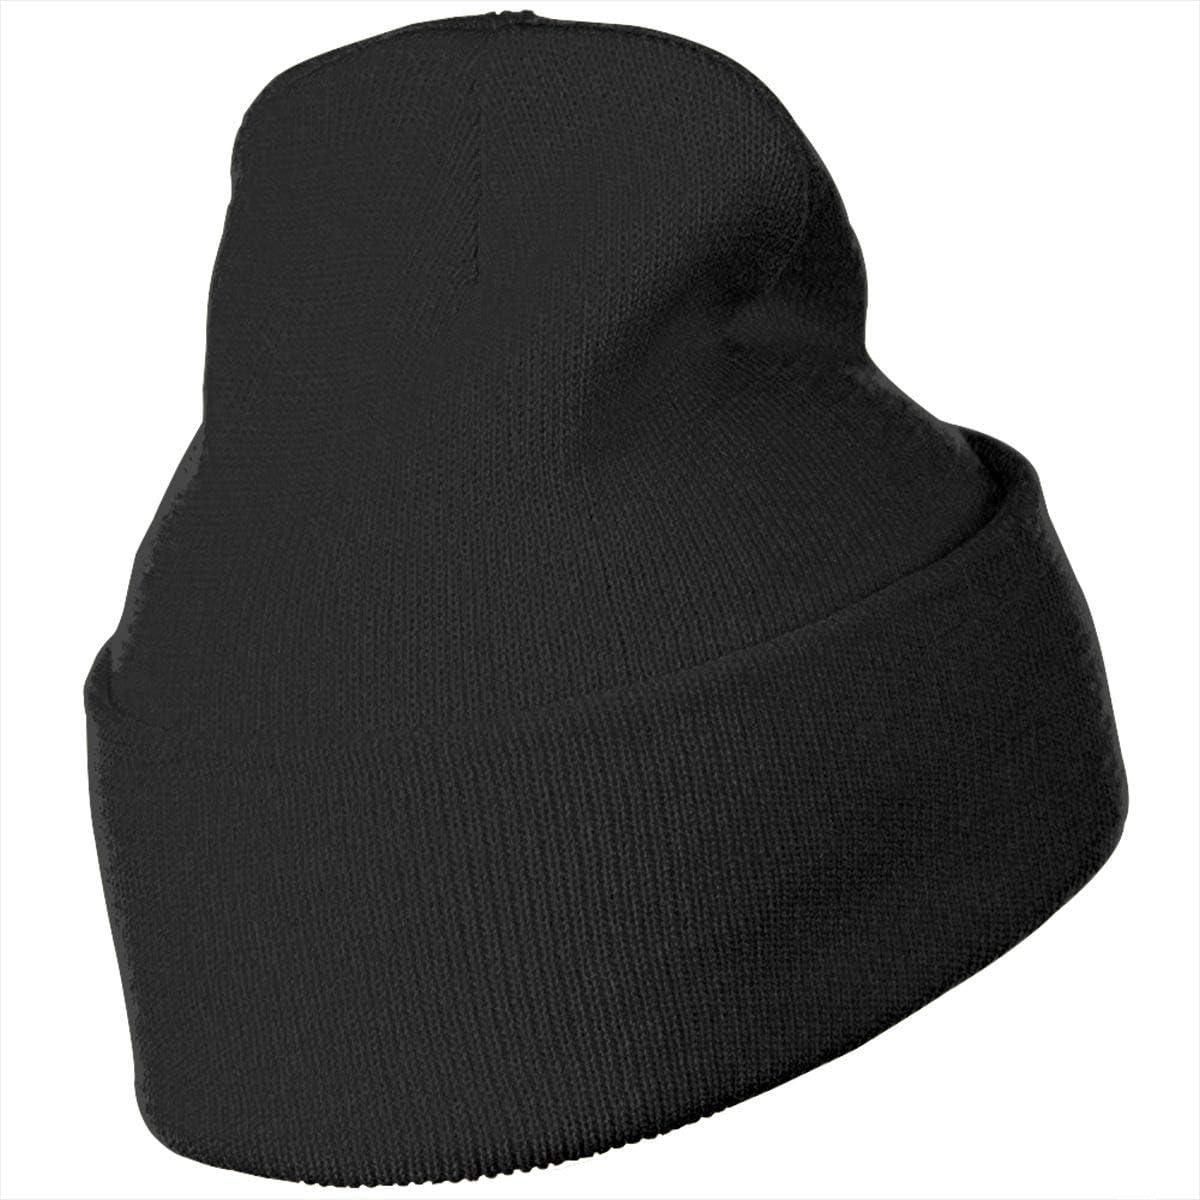 Great Pumpkin Believer Winter Warm Hats,Knit Slouchy Thick Skull Cap Black